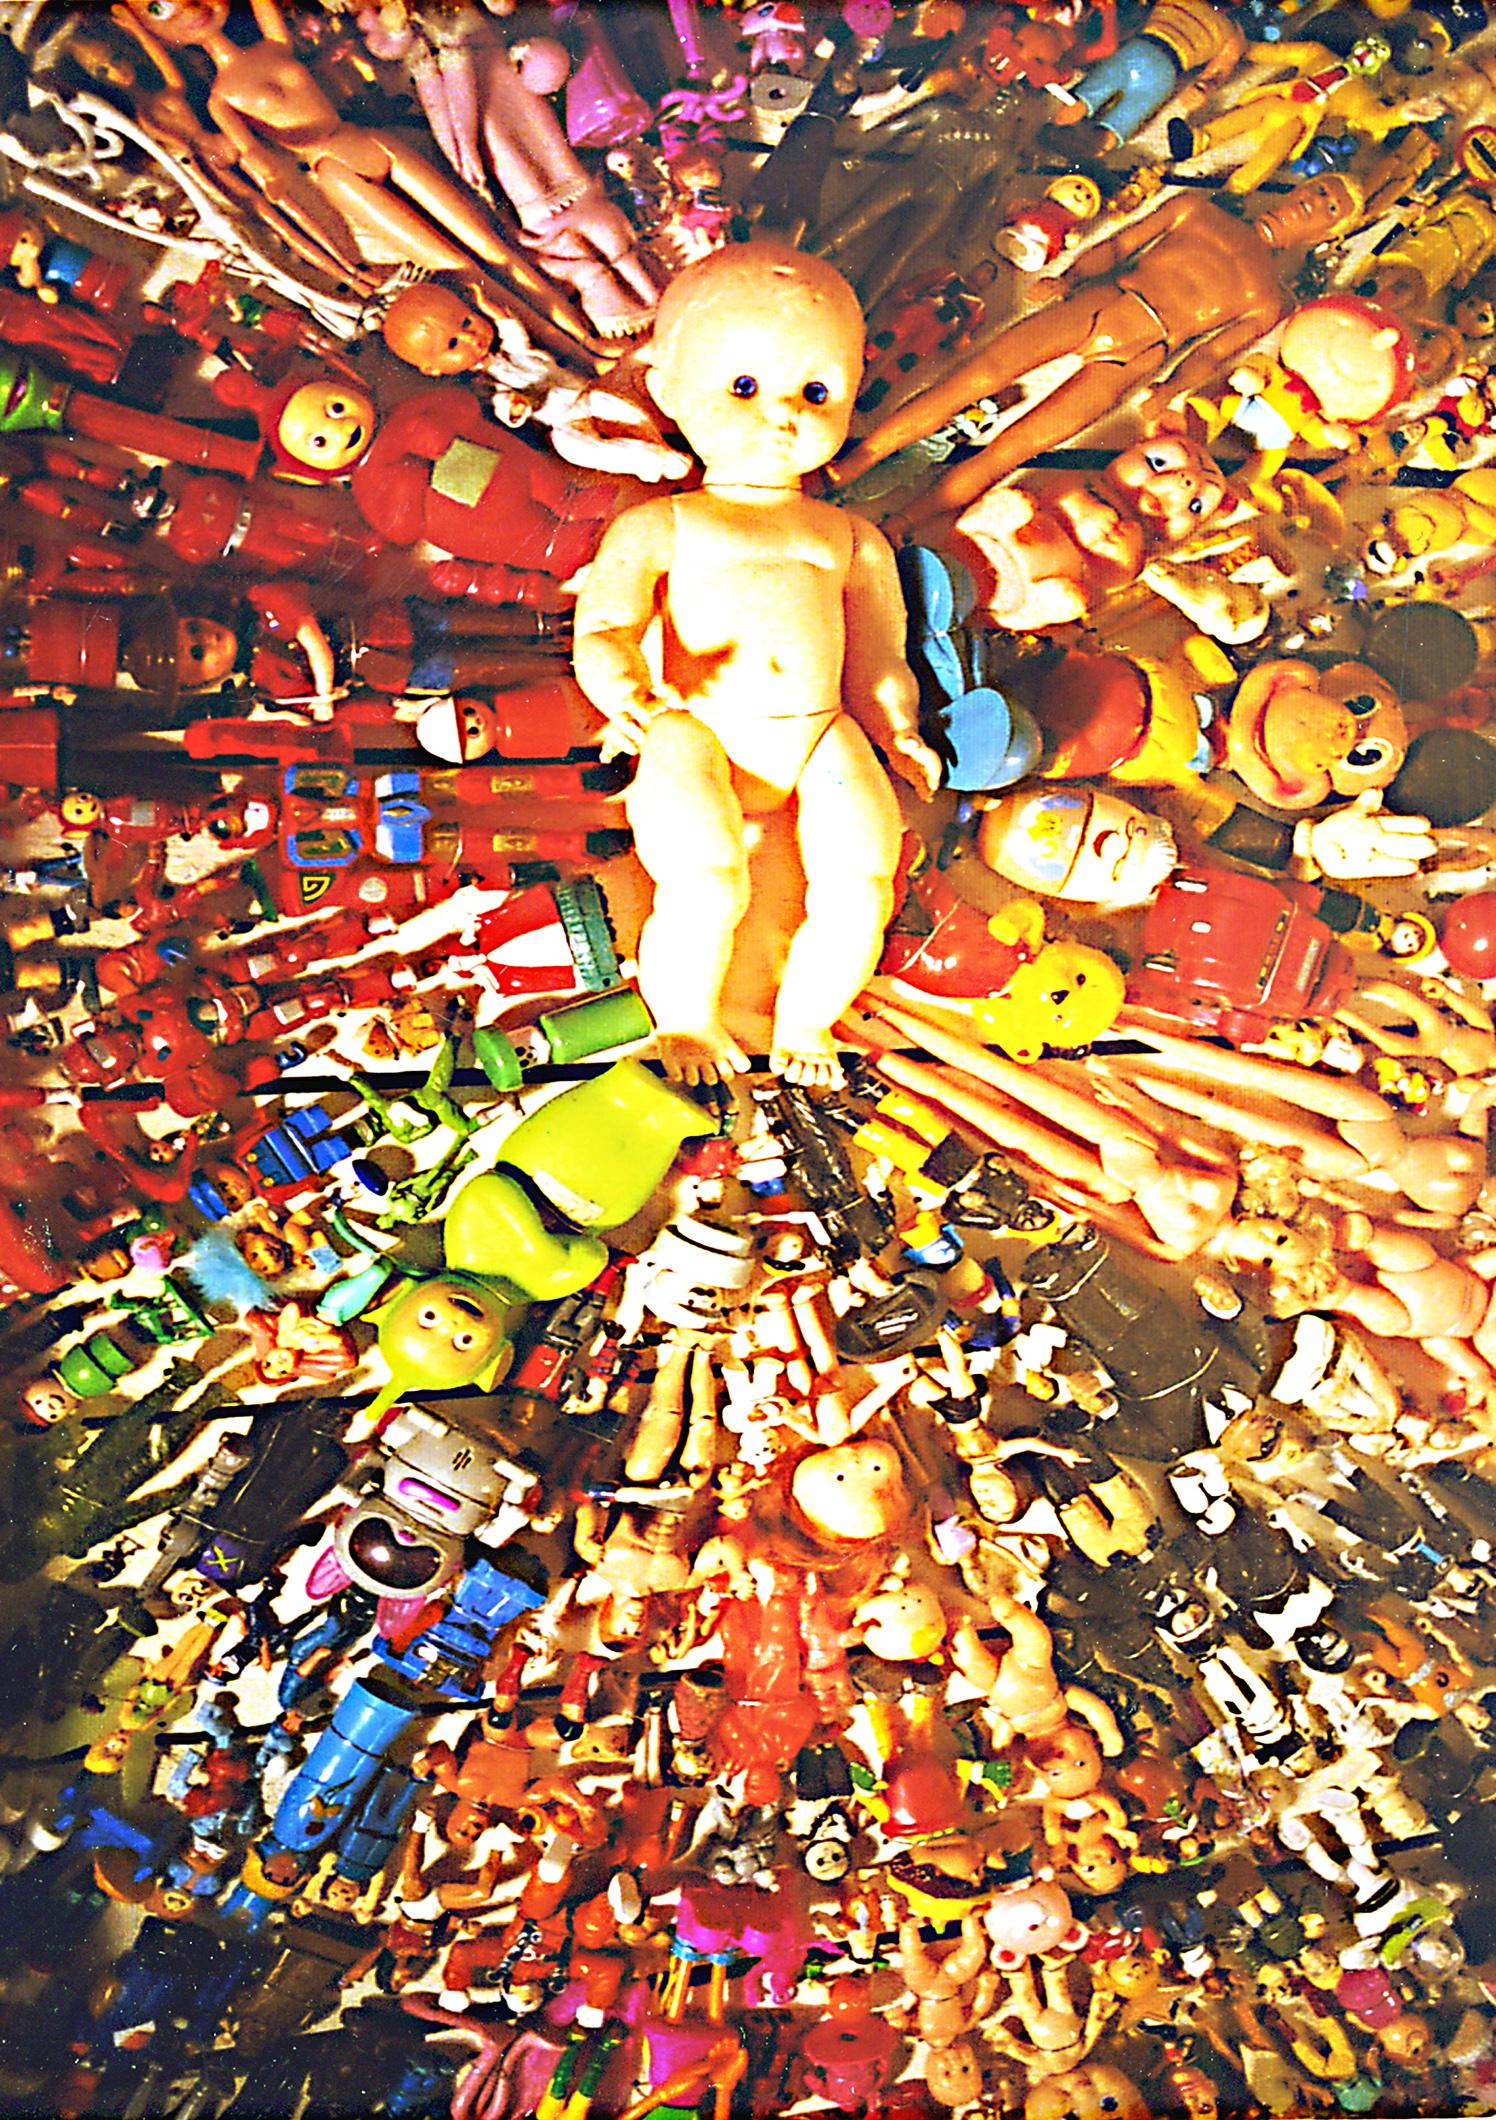 Plastic Toys Dolls Assemblage Art 3D